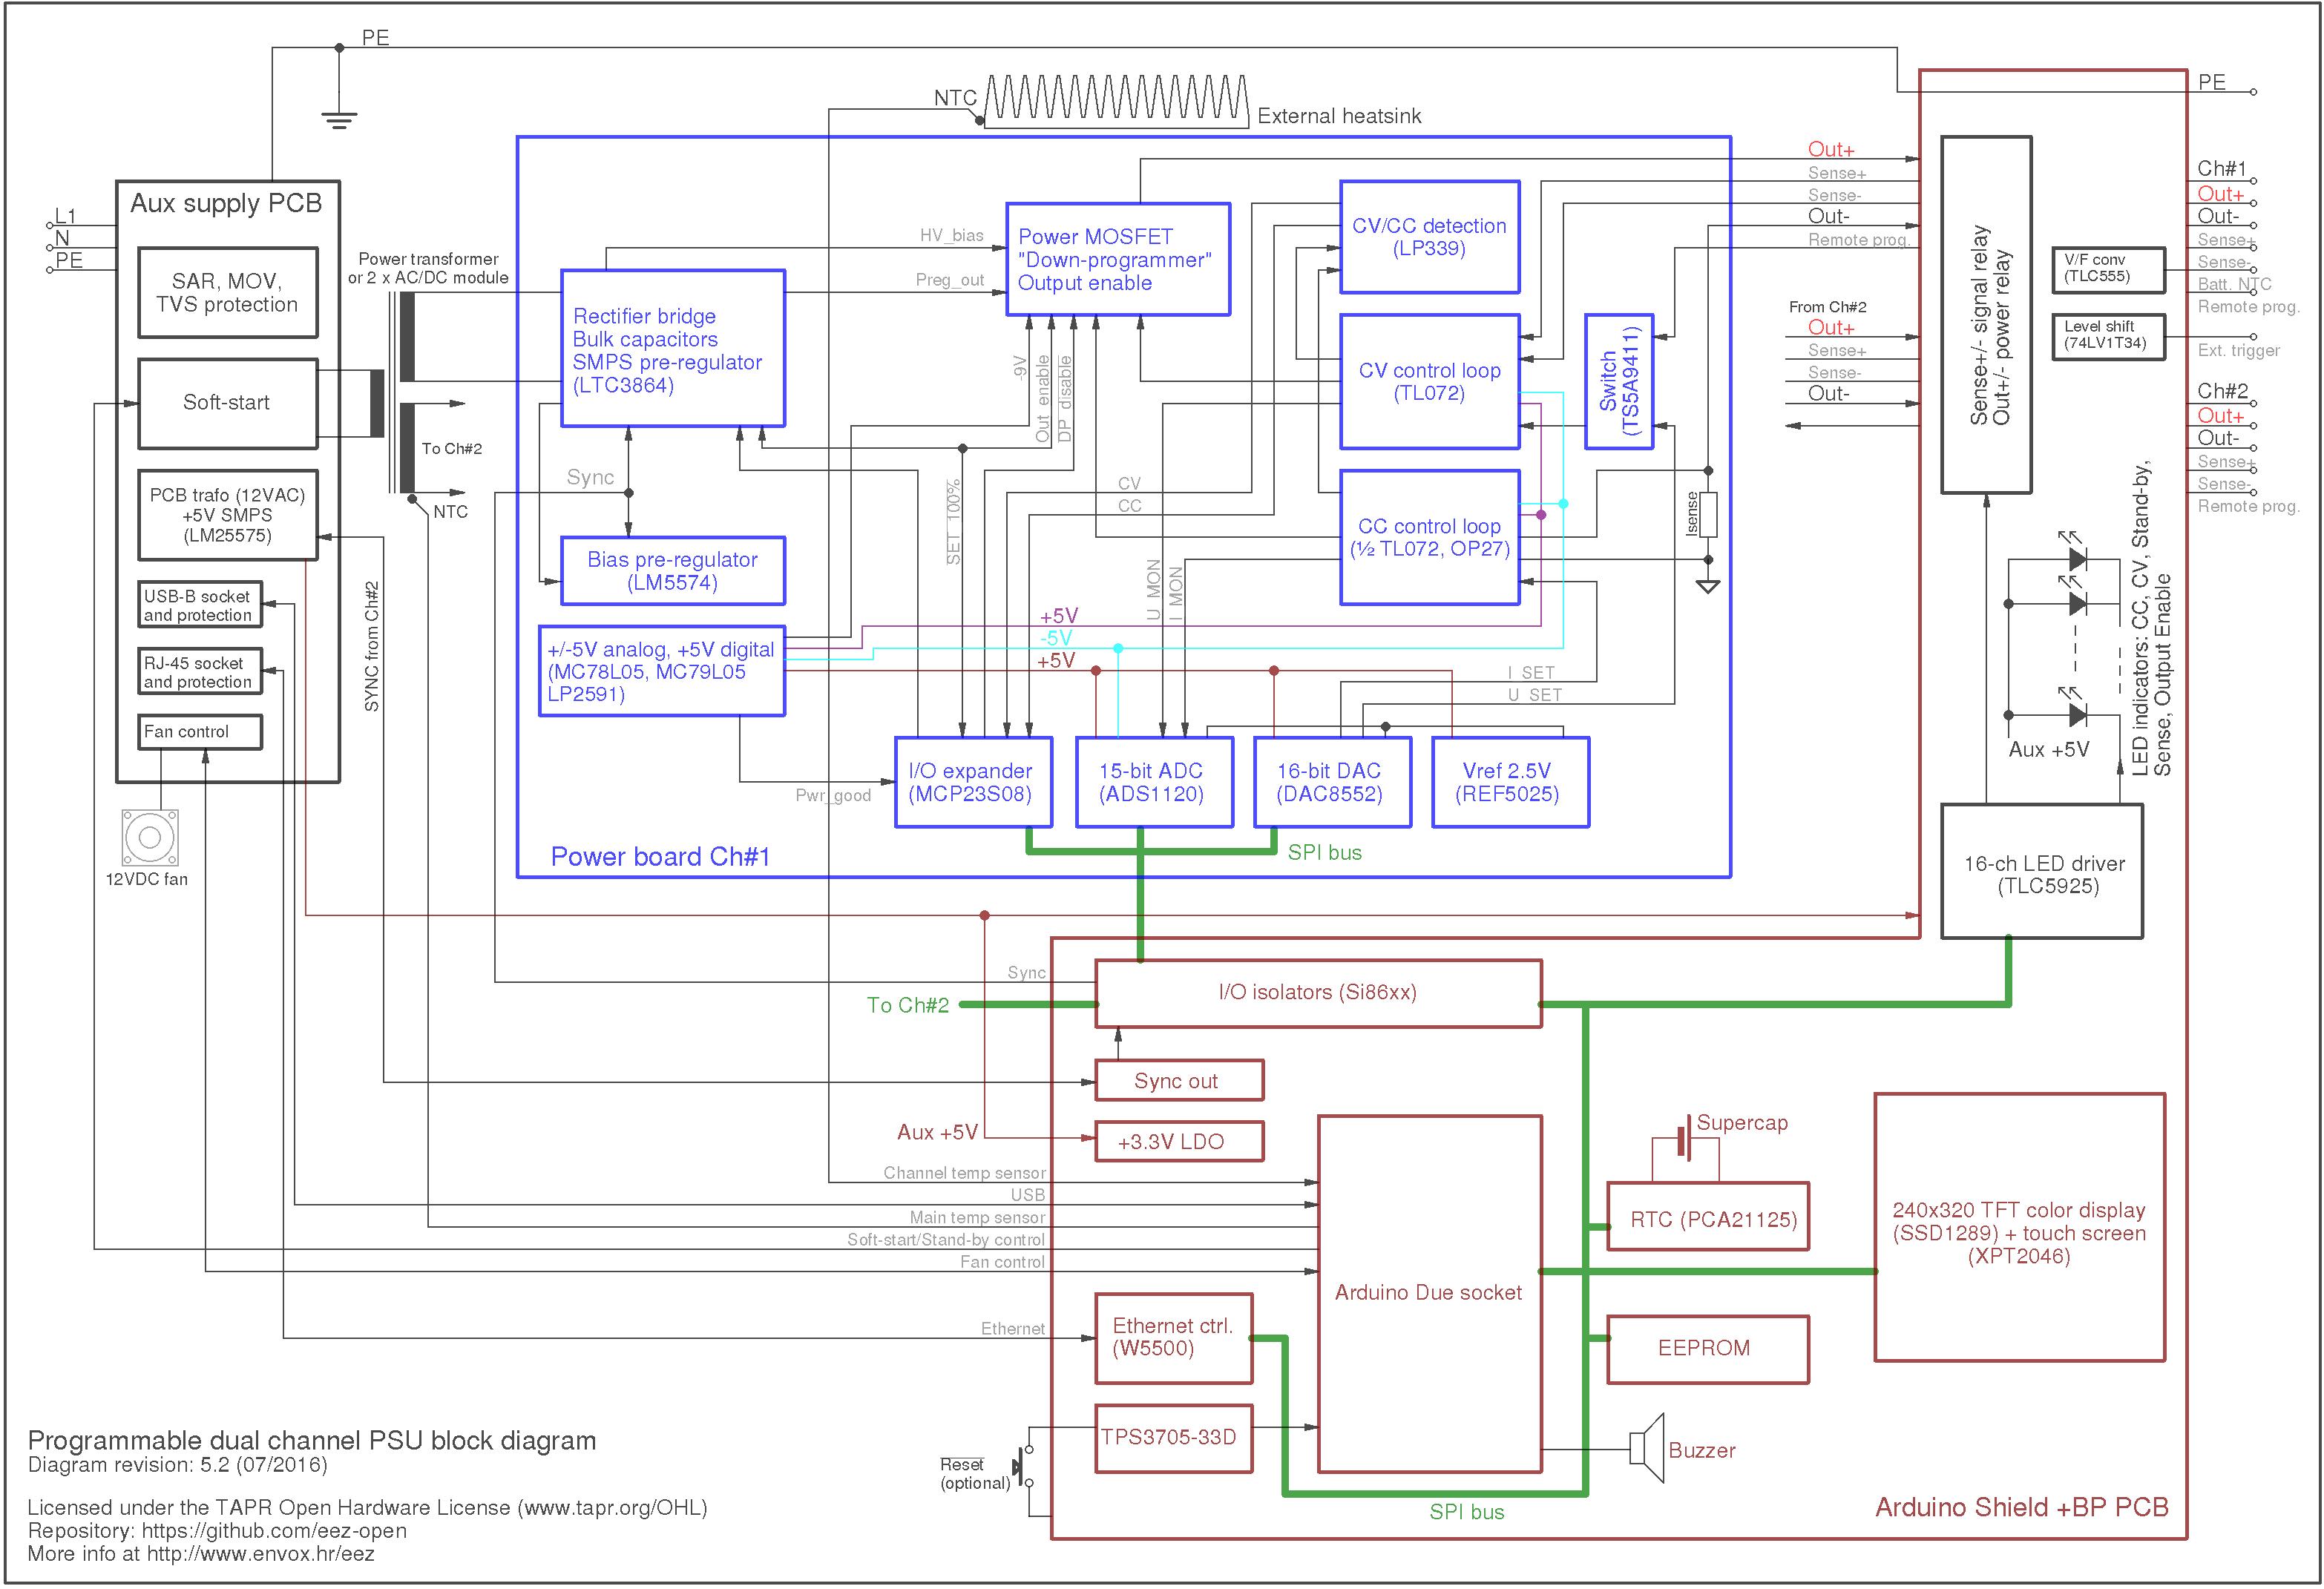 H24005 PSU Block Diagram - Electronics-Lab